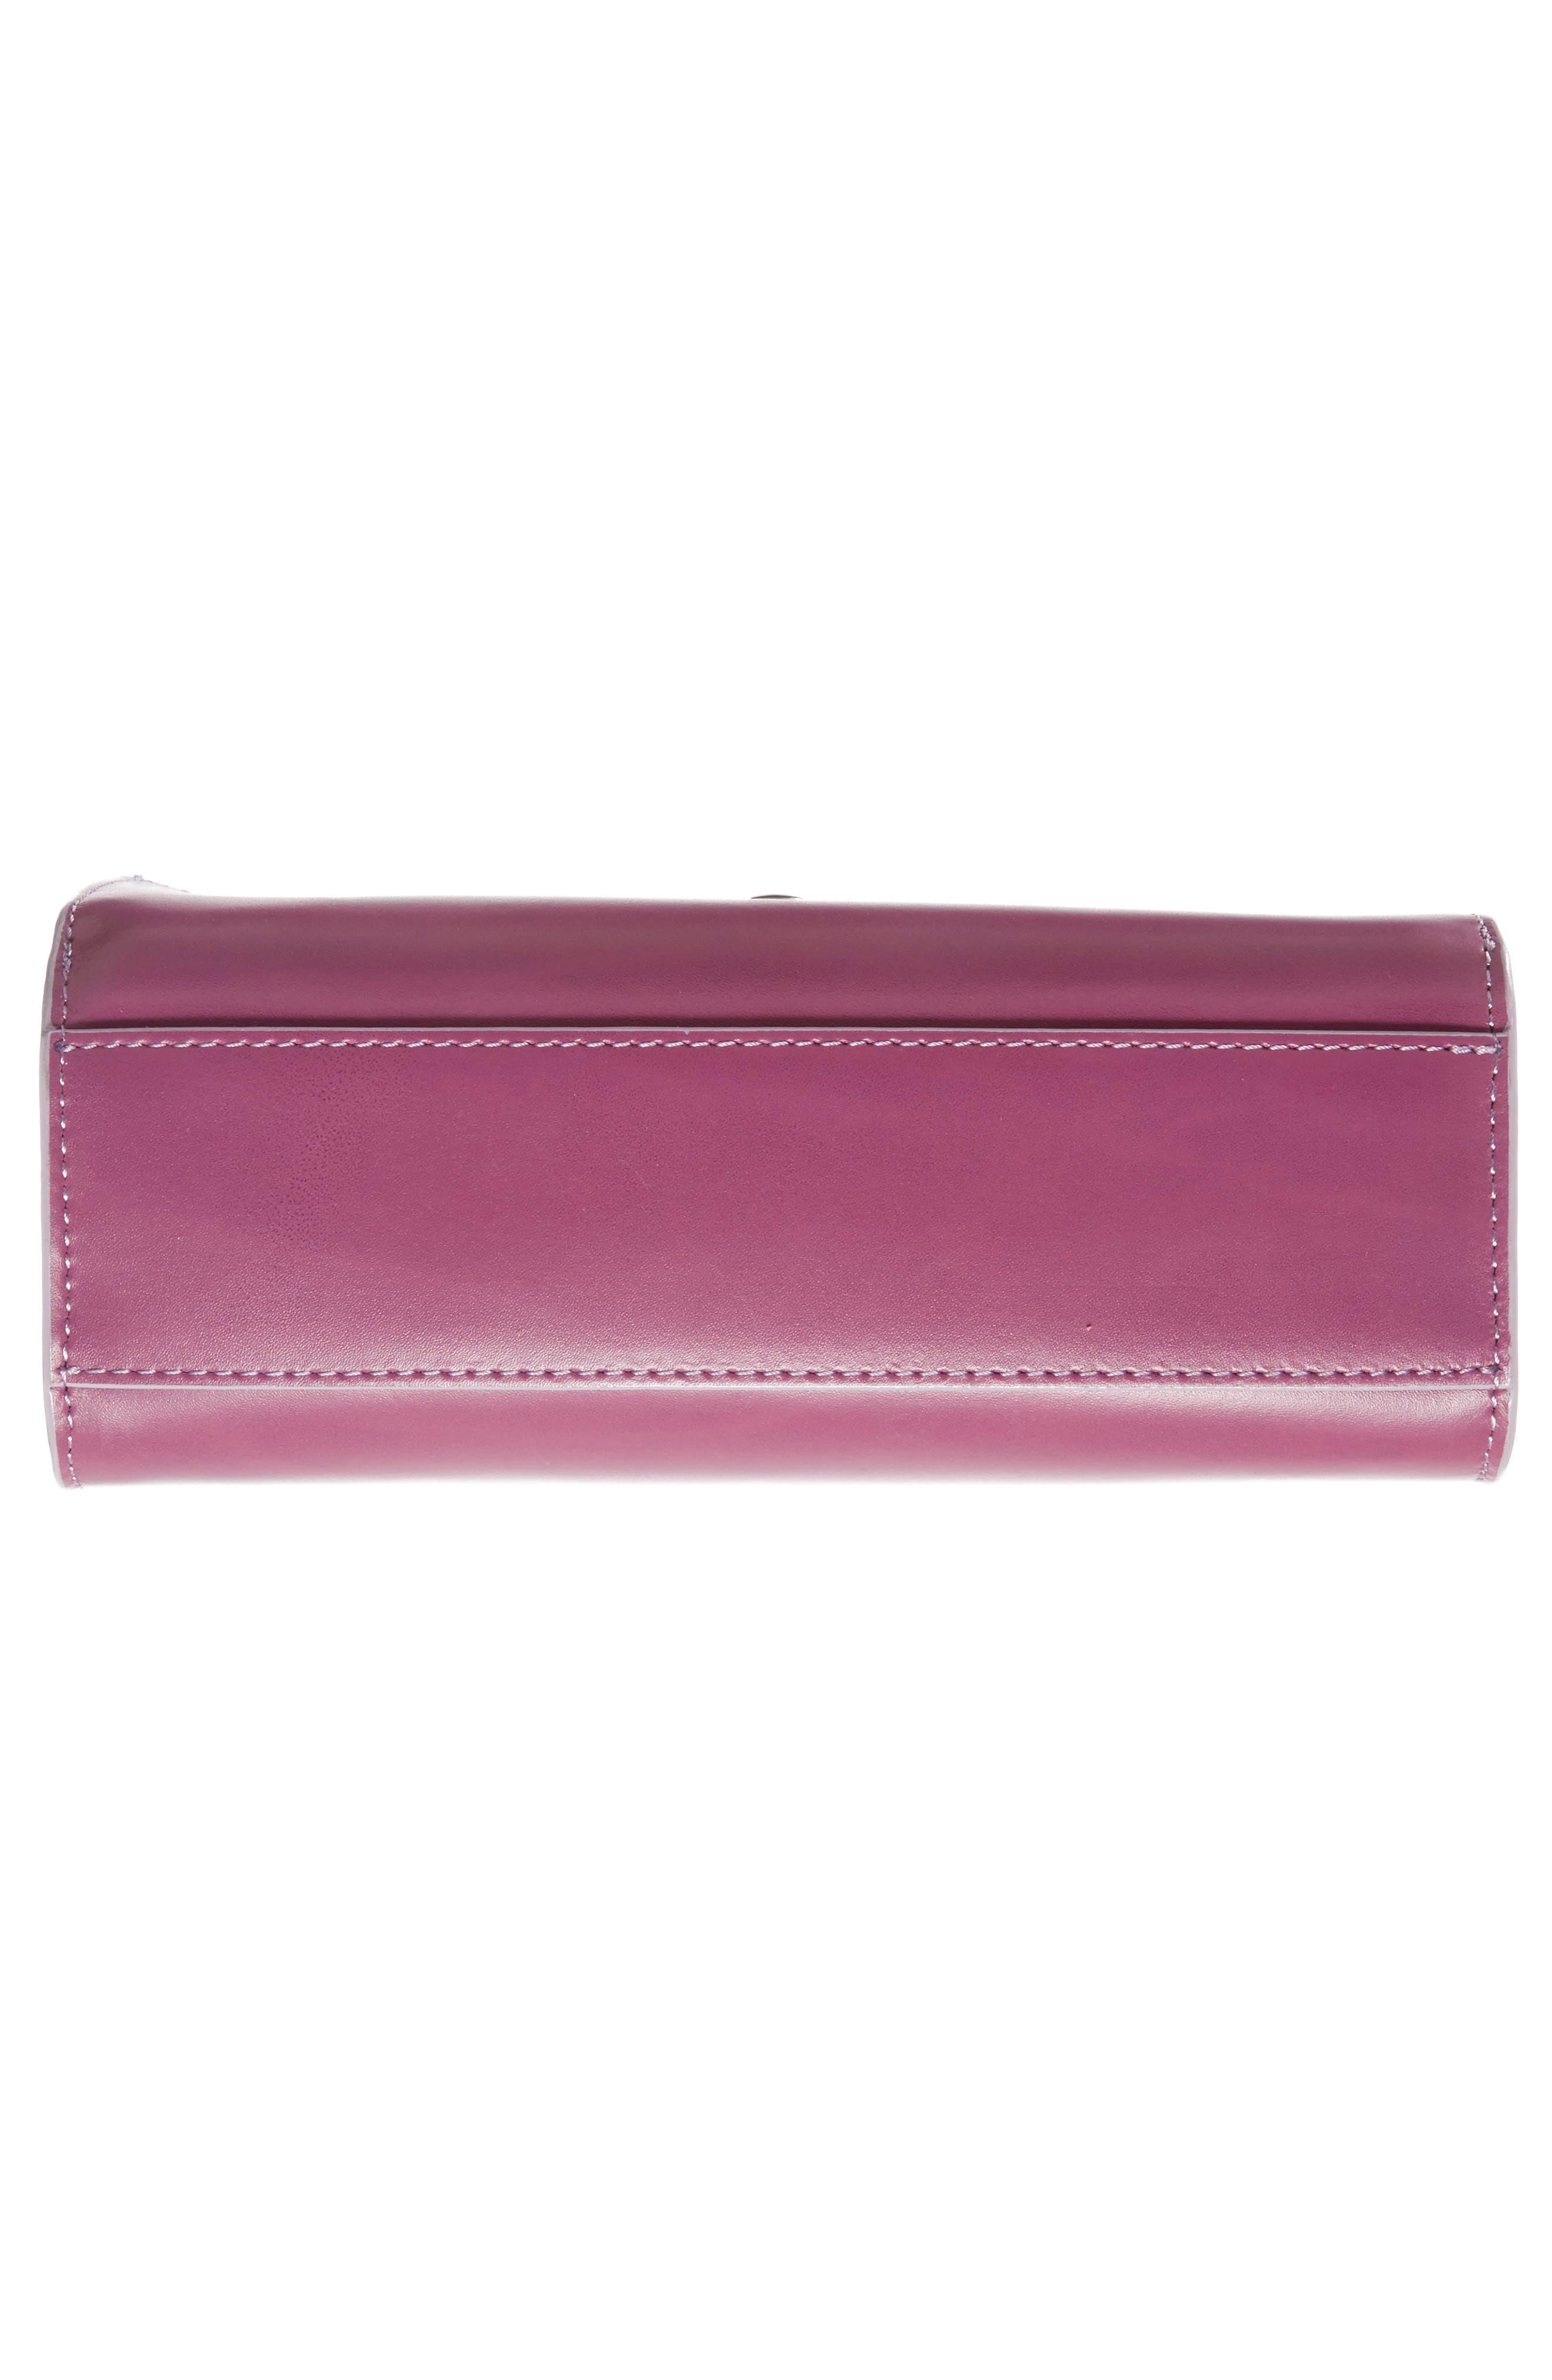 Lodis'Audrey Collection -Vicky' ConvertibleCrossbody Bag,                             Alternate thumbnail 38, color,